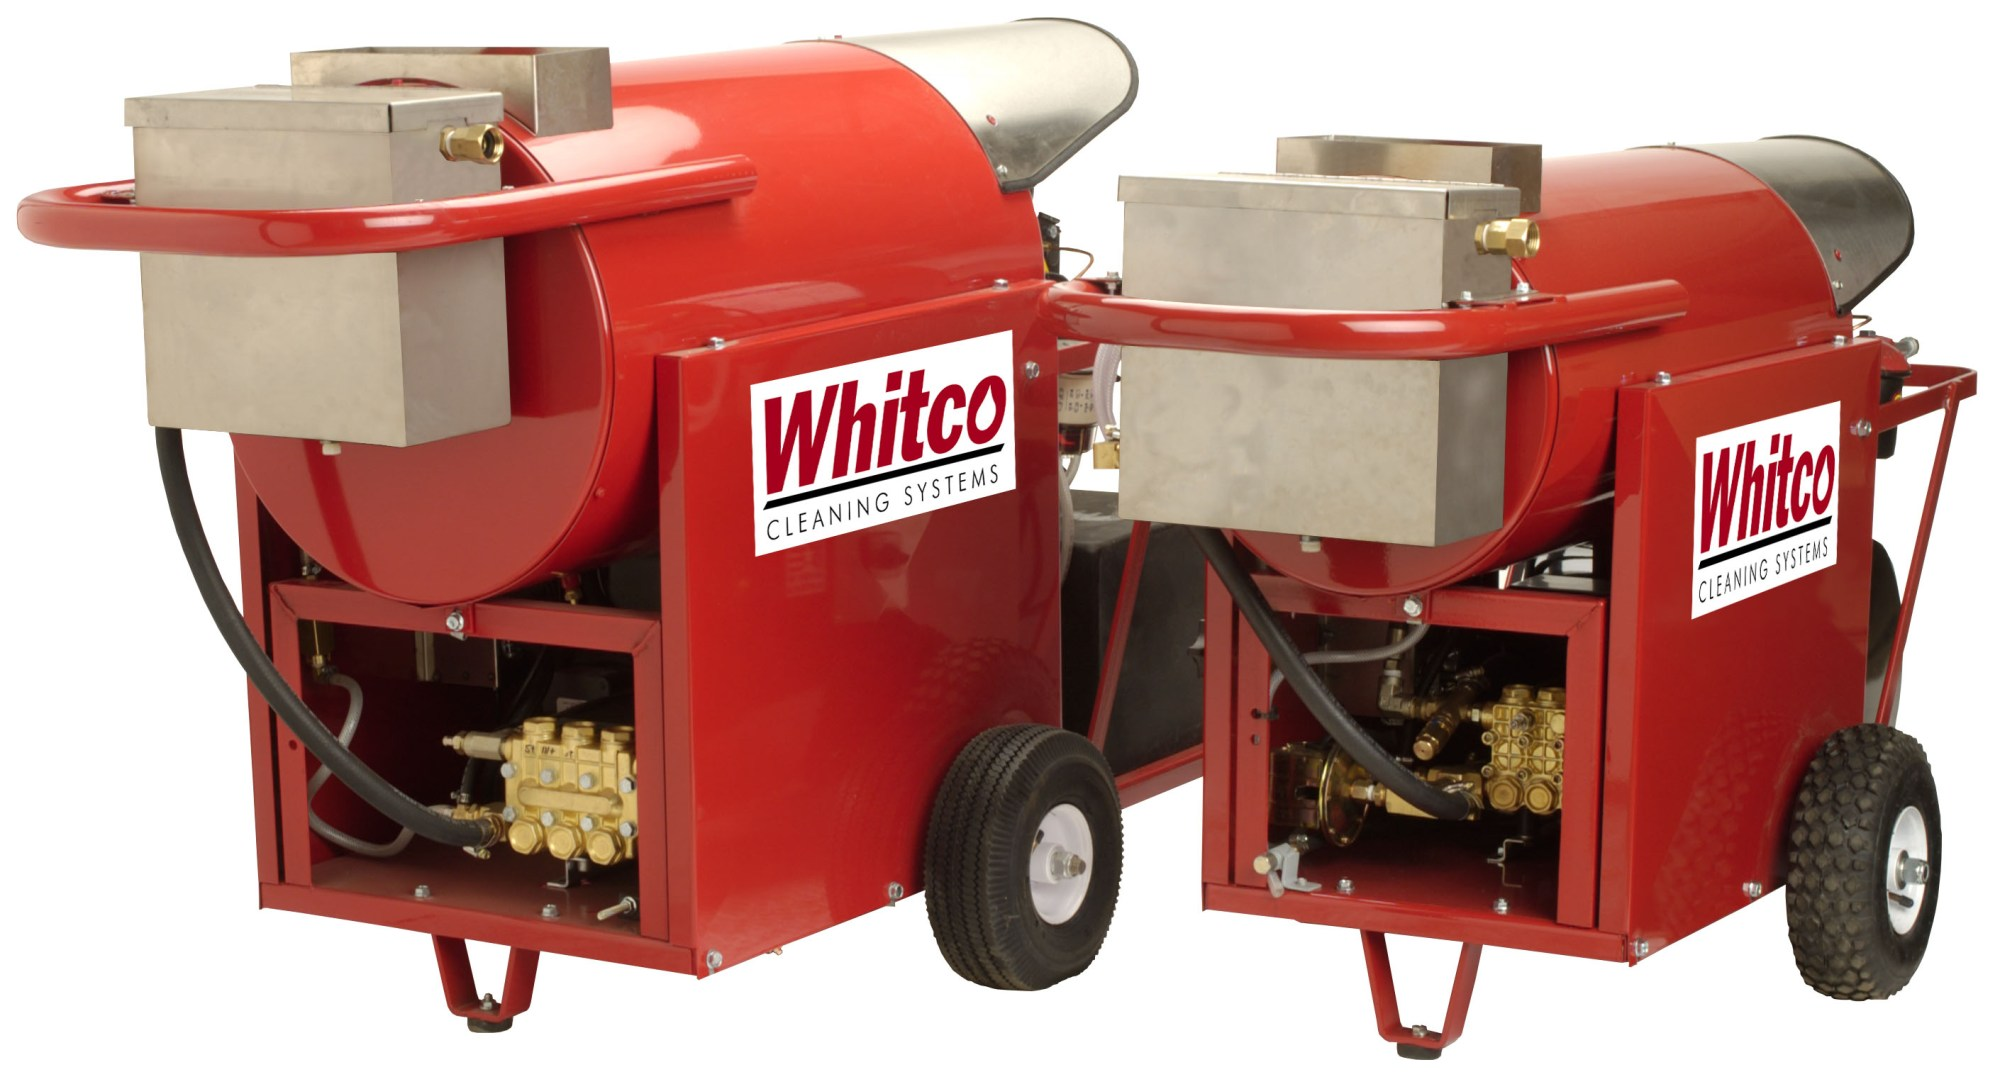 hight resolution of whitco wiring diagram stinger pressure washers whitco power wash solutionsstinger pressure washers u2013 whitco